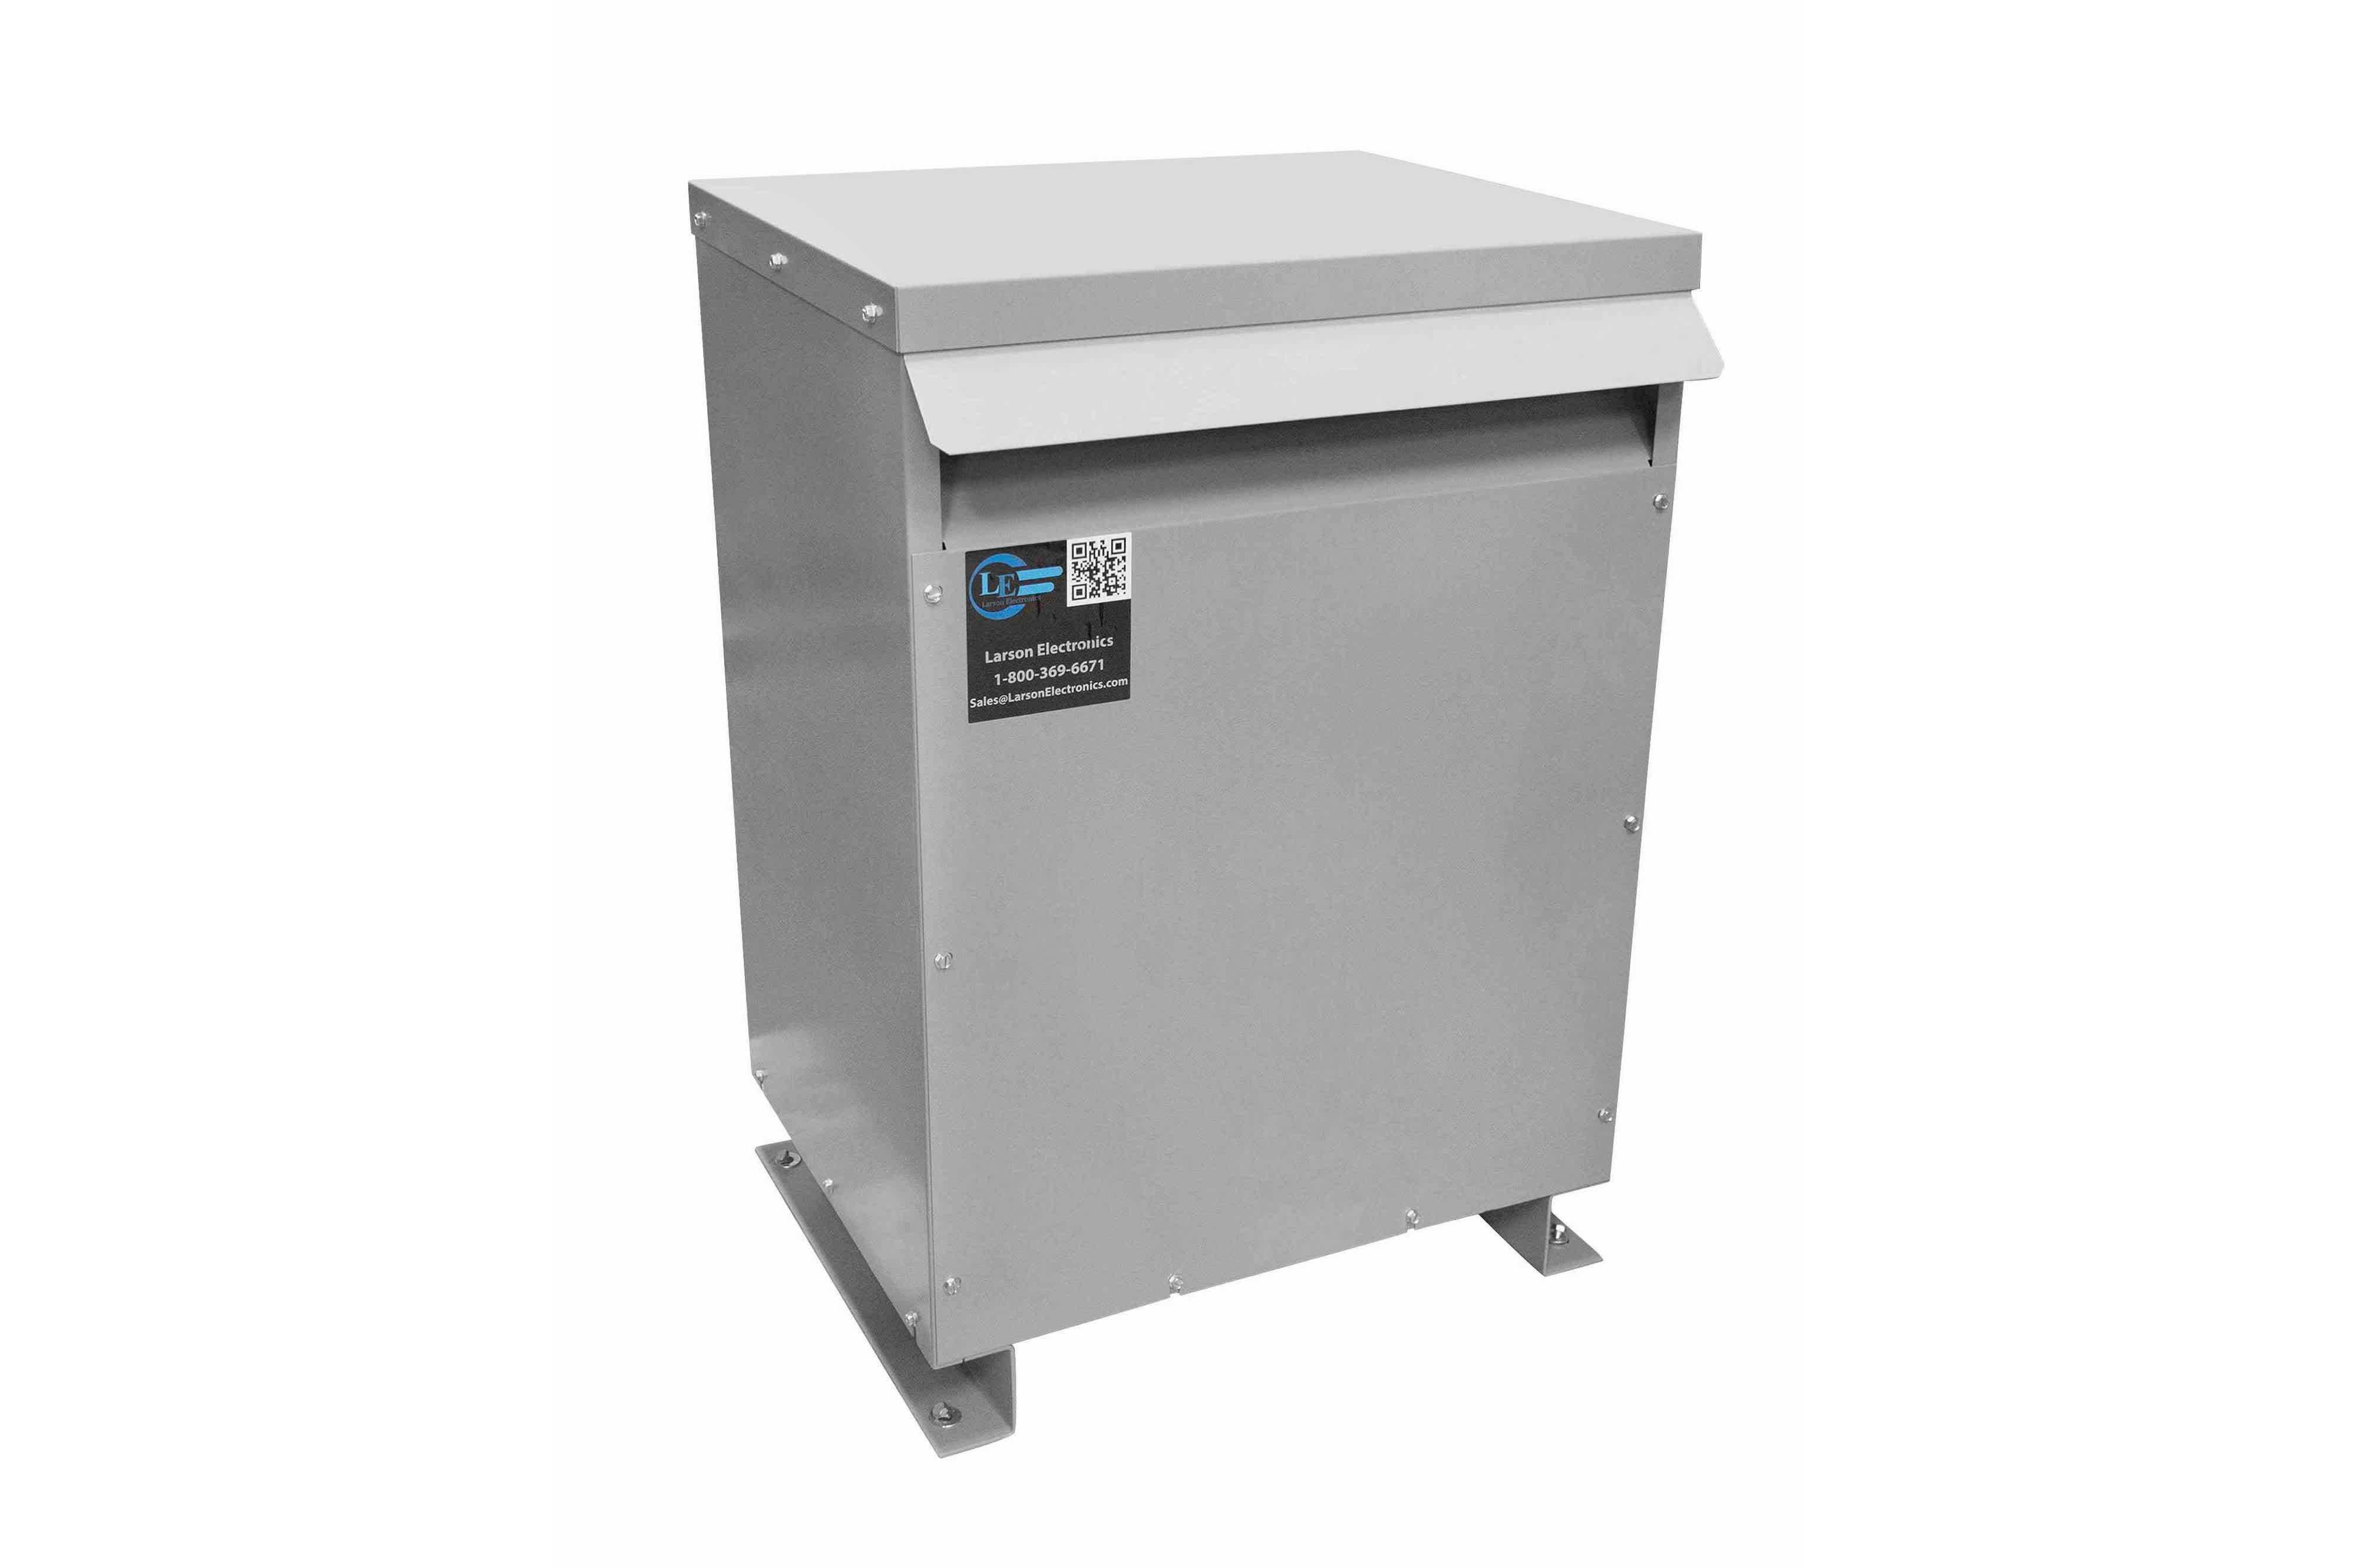 18 kVA 3PH Isolation Transformer, 415V Wye Primary, 480V Delta Secondary, N3R, Ventilated, 60 Hz